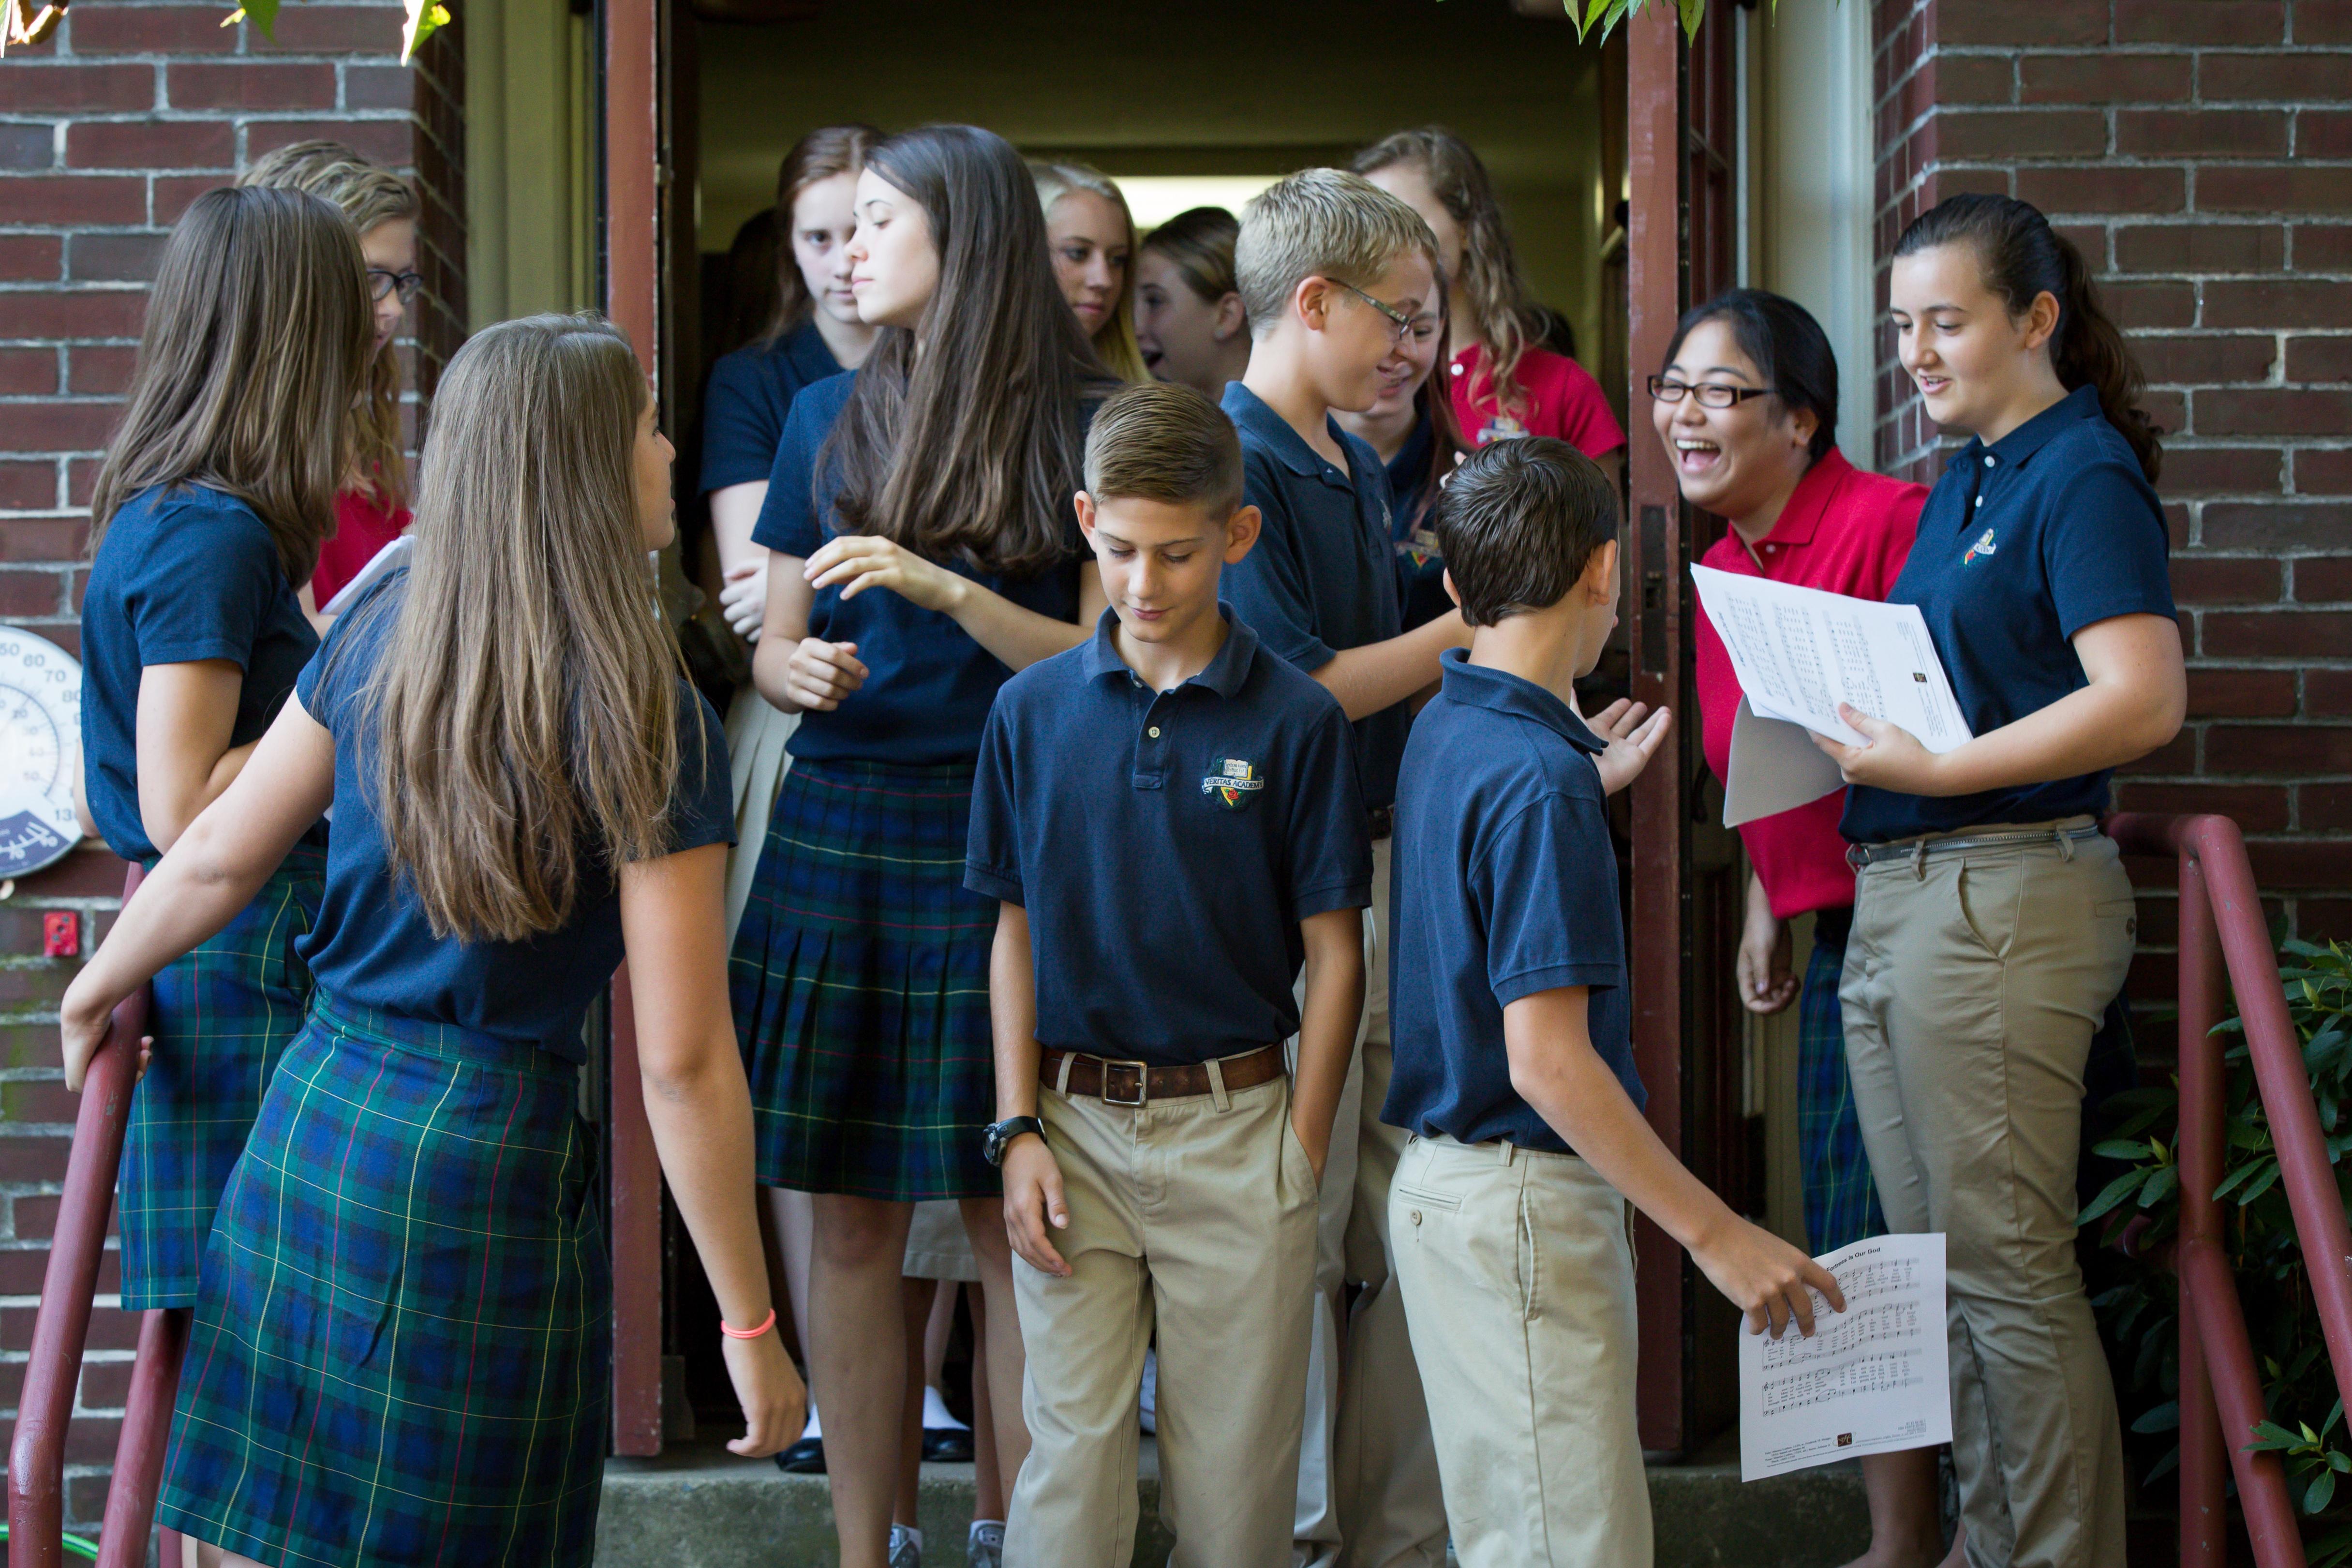 veritas students   Veritas Academy   Classical Christian School